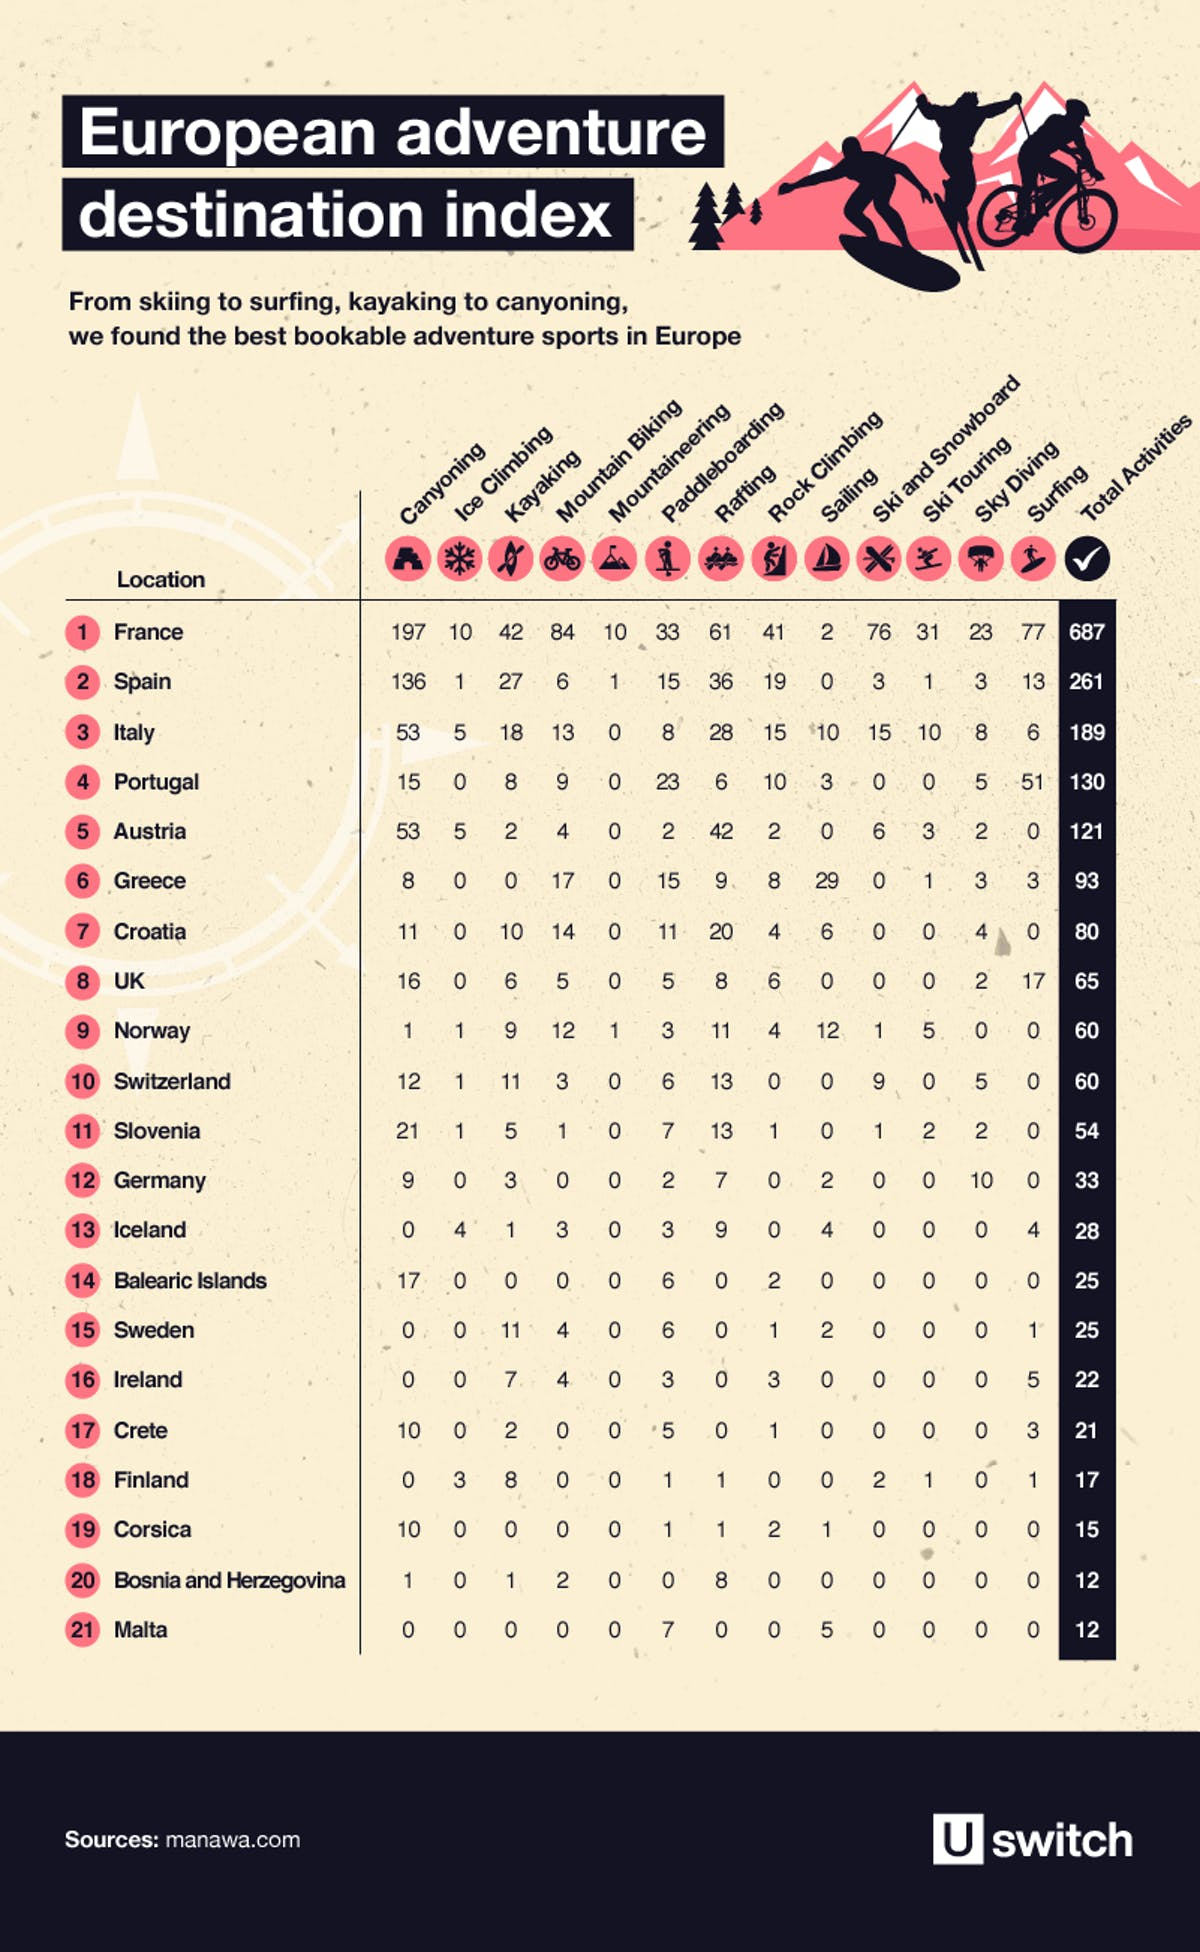 Table showing the European adventure destination index